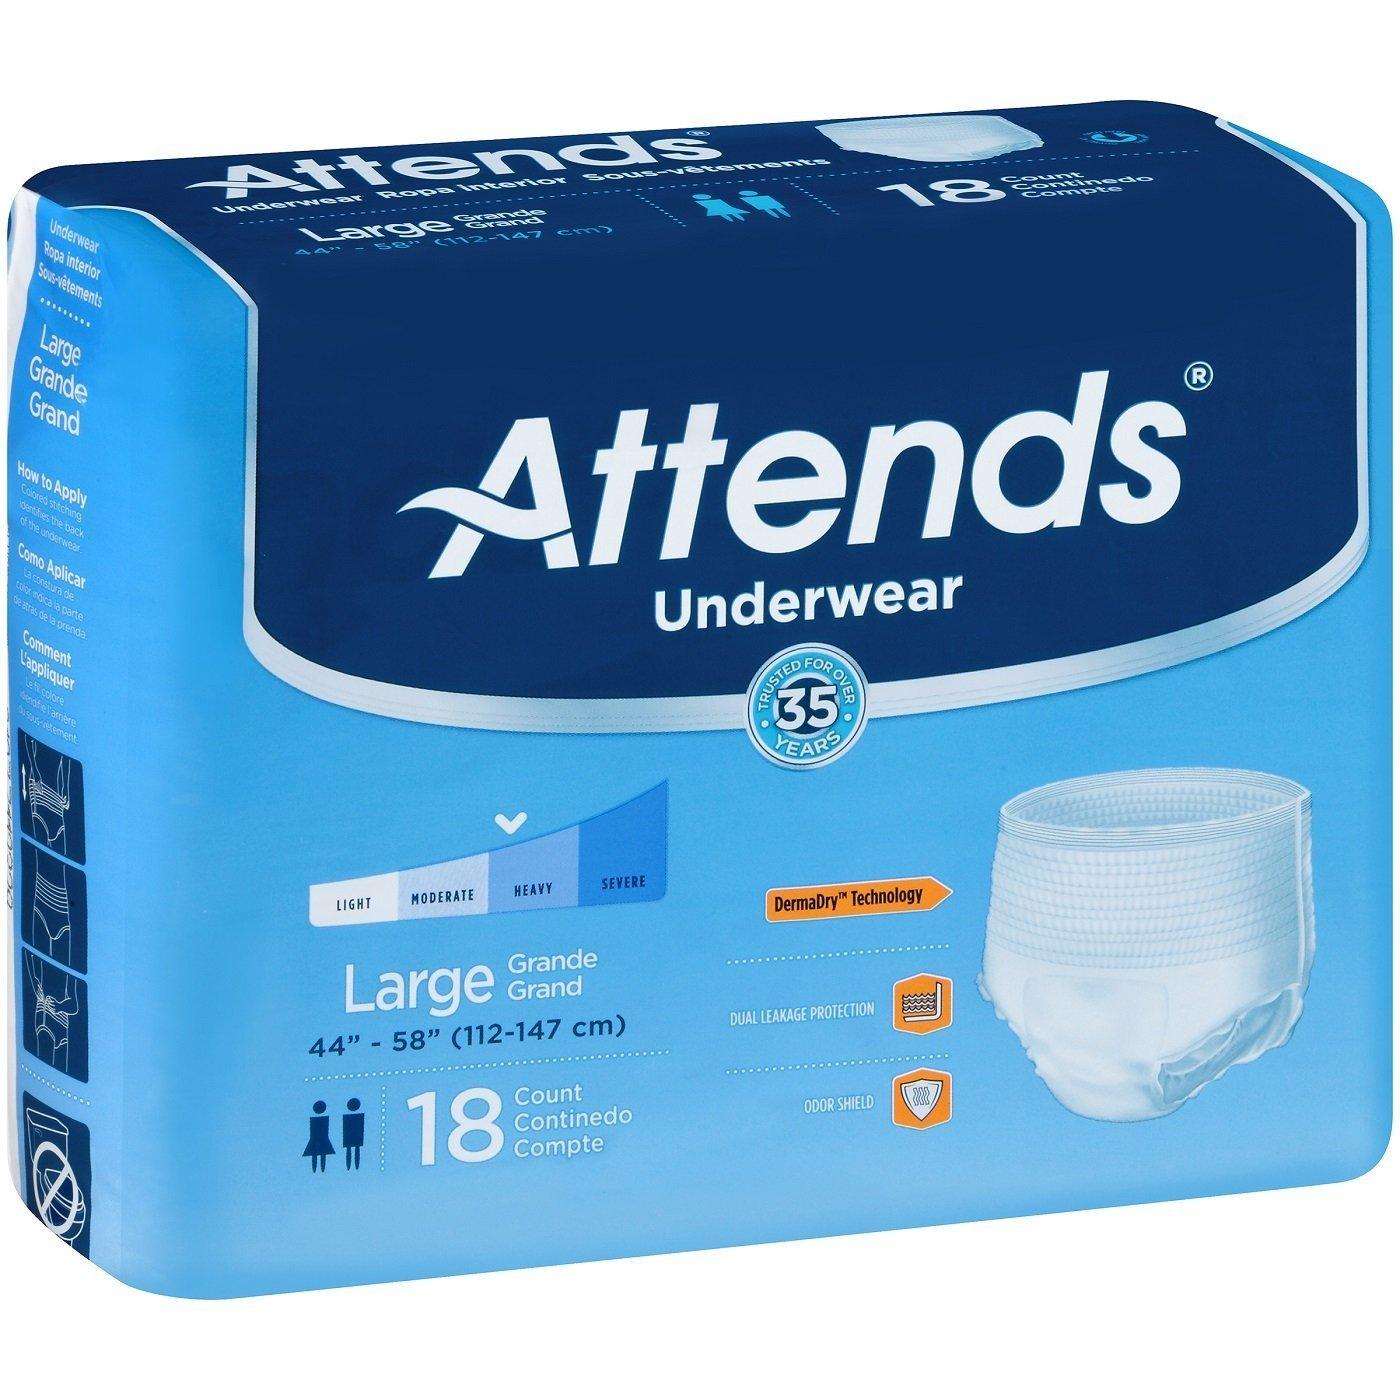 *Attends Underwear Extra Absorbency Large - Case of 72 - Model AP0730